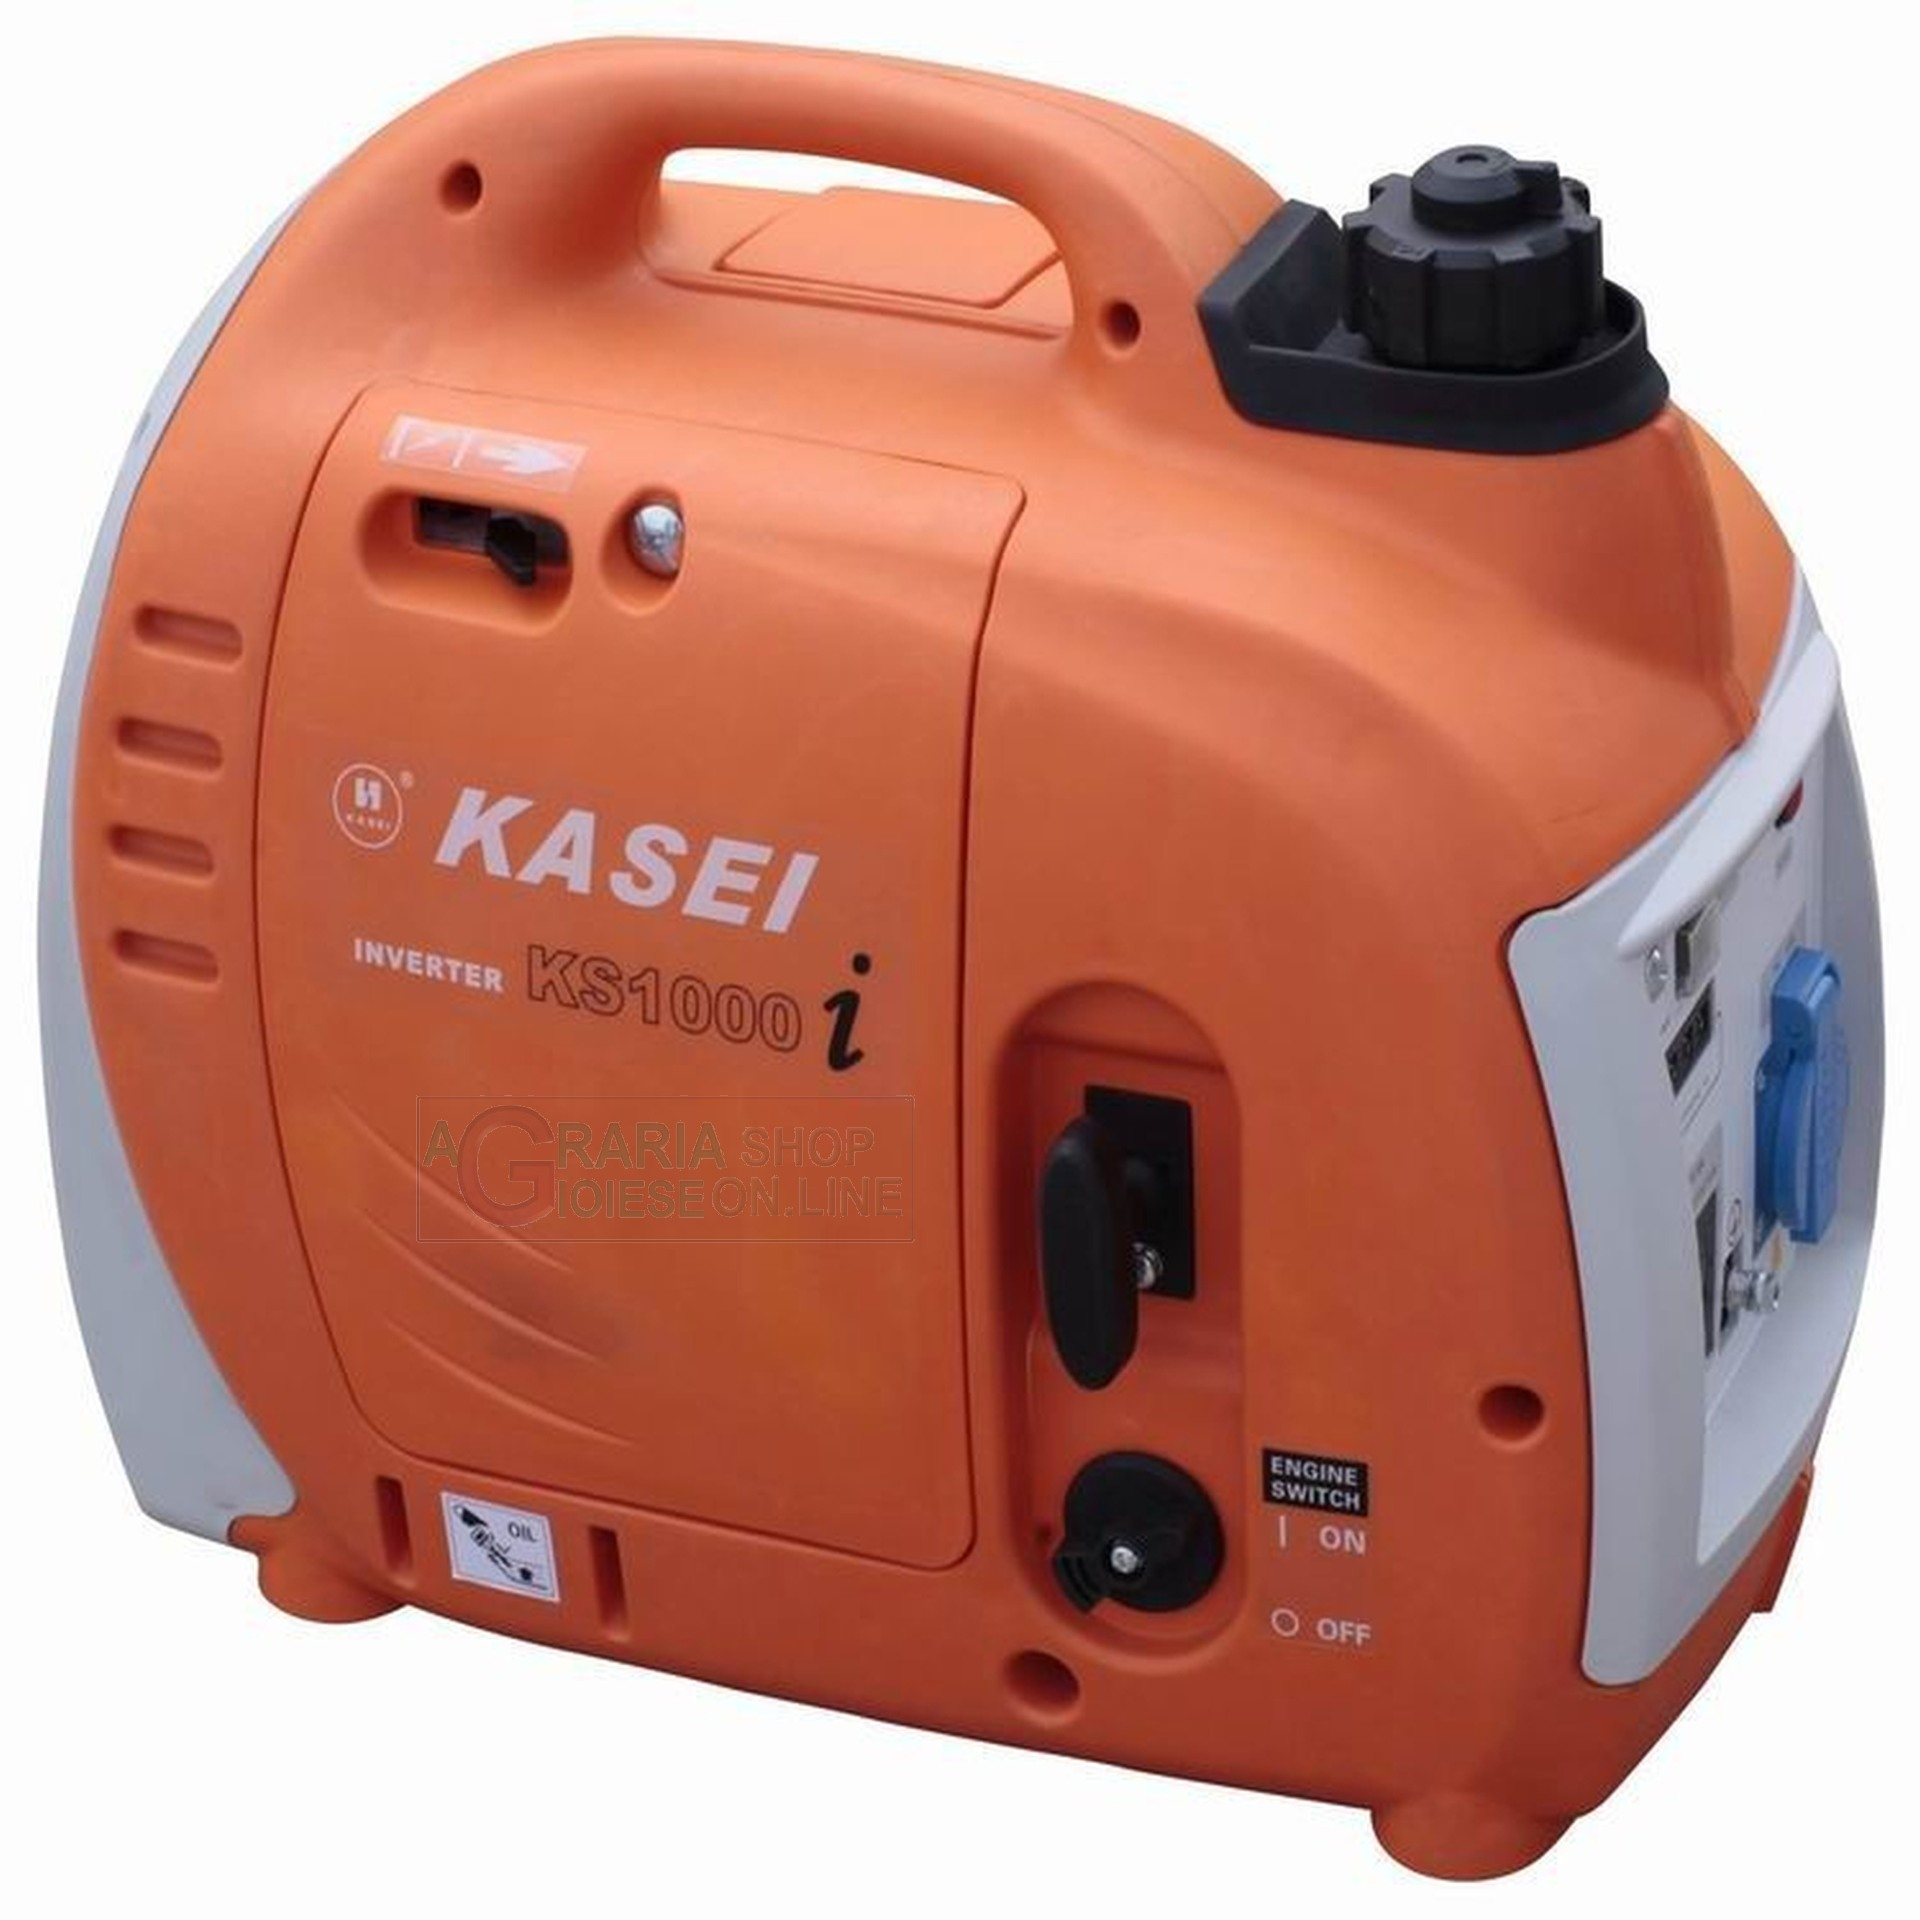 Generatore ad inverter professionale kasei ks1000i portatile for Generatore emergenza casa